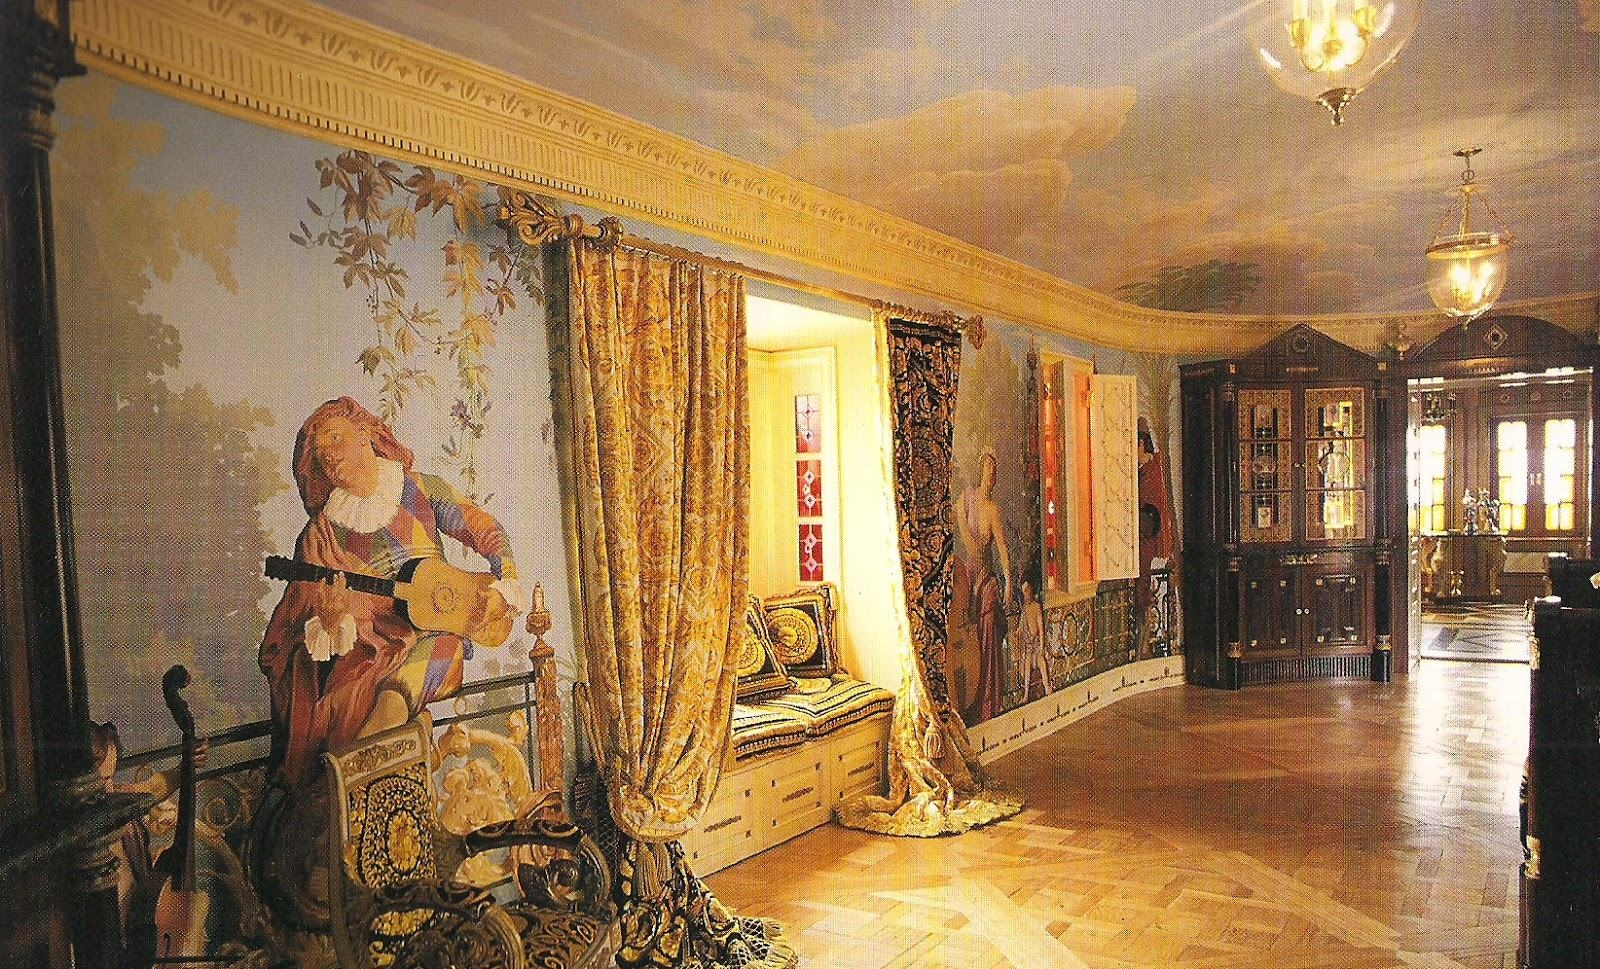 Gianni versace wallpaper wallpapersafari for Wallpaper versace home